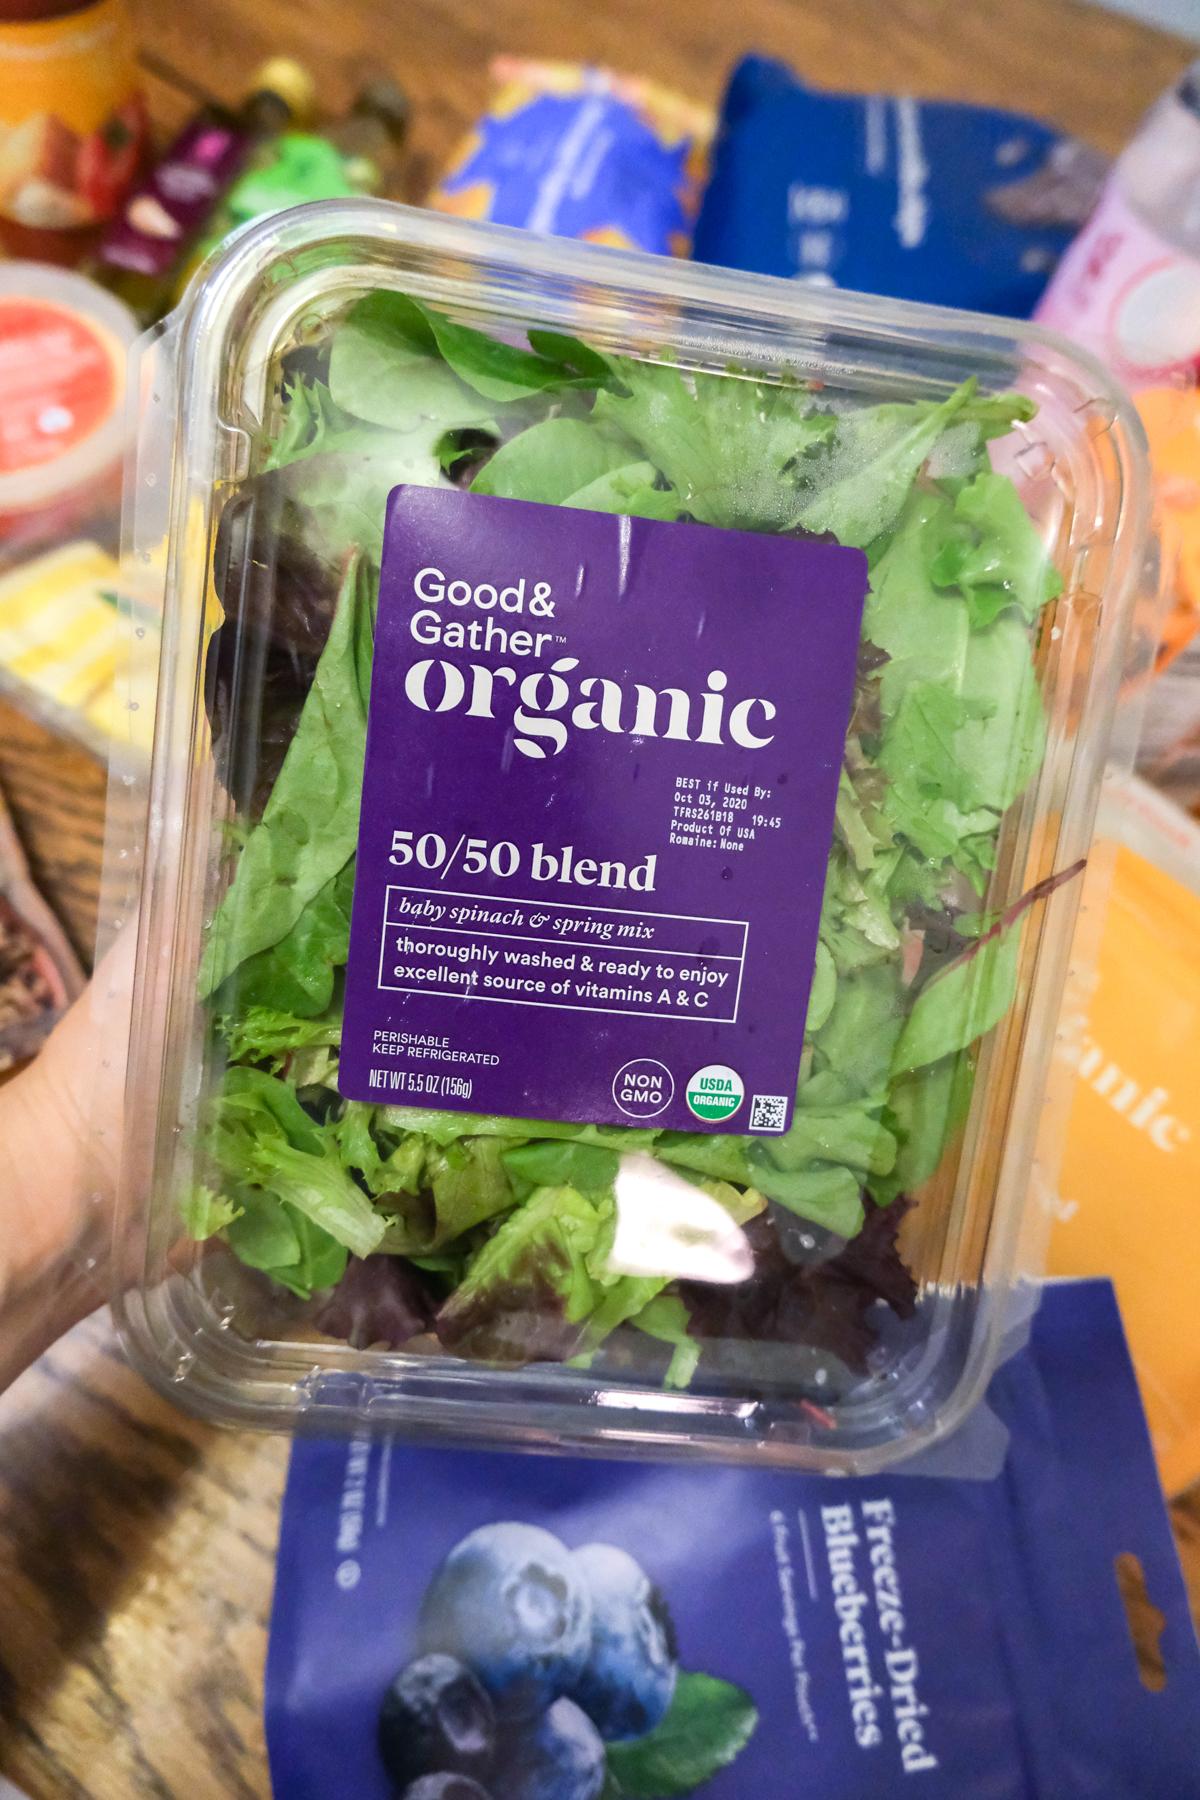 organic 50/50 blend salad greens Good & Gather from Target